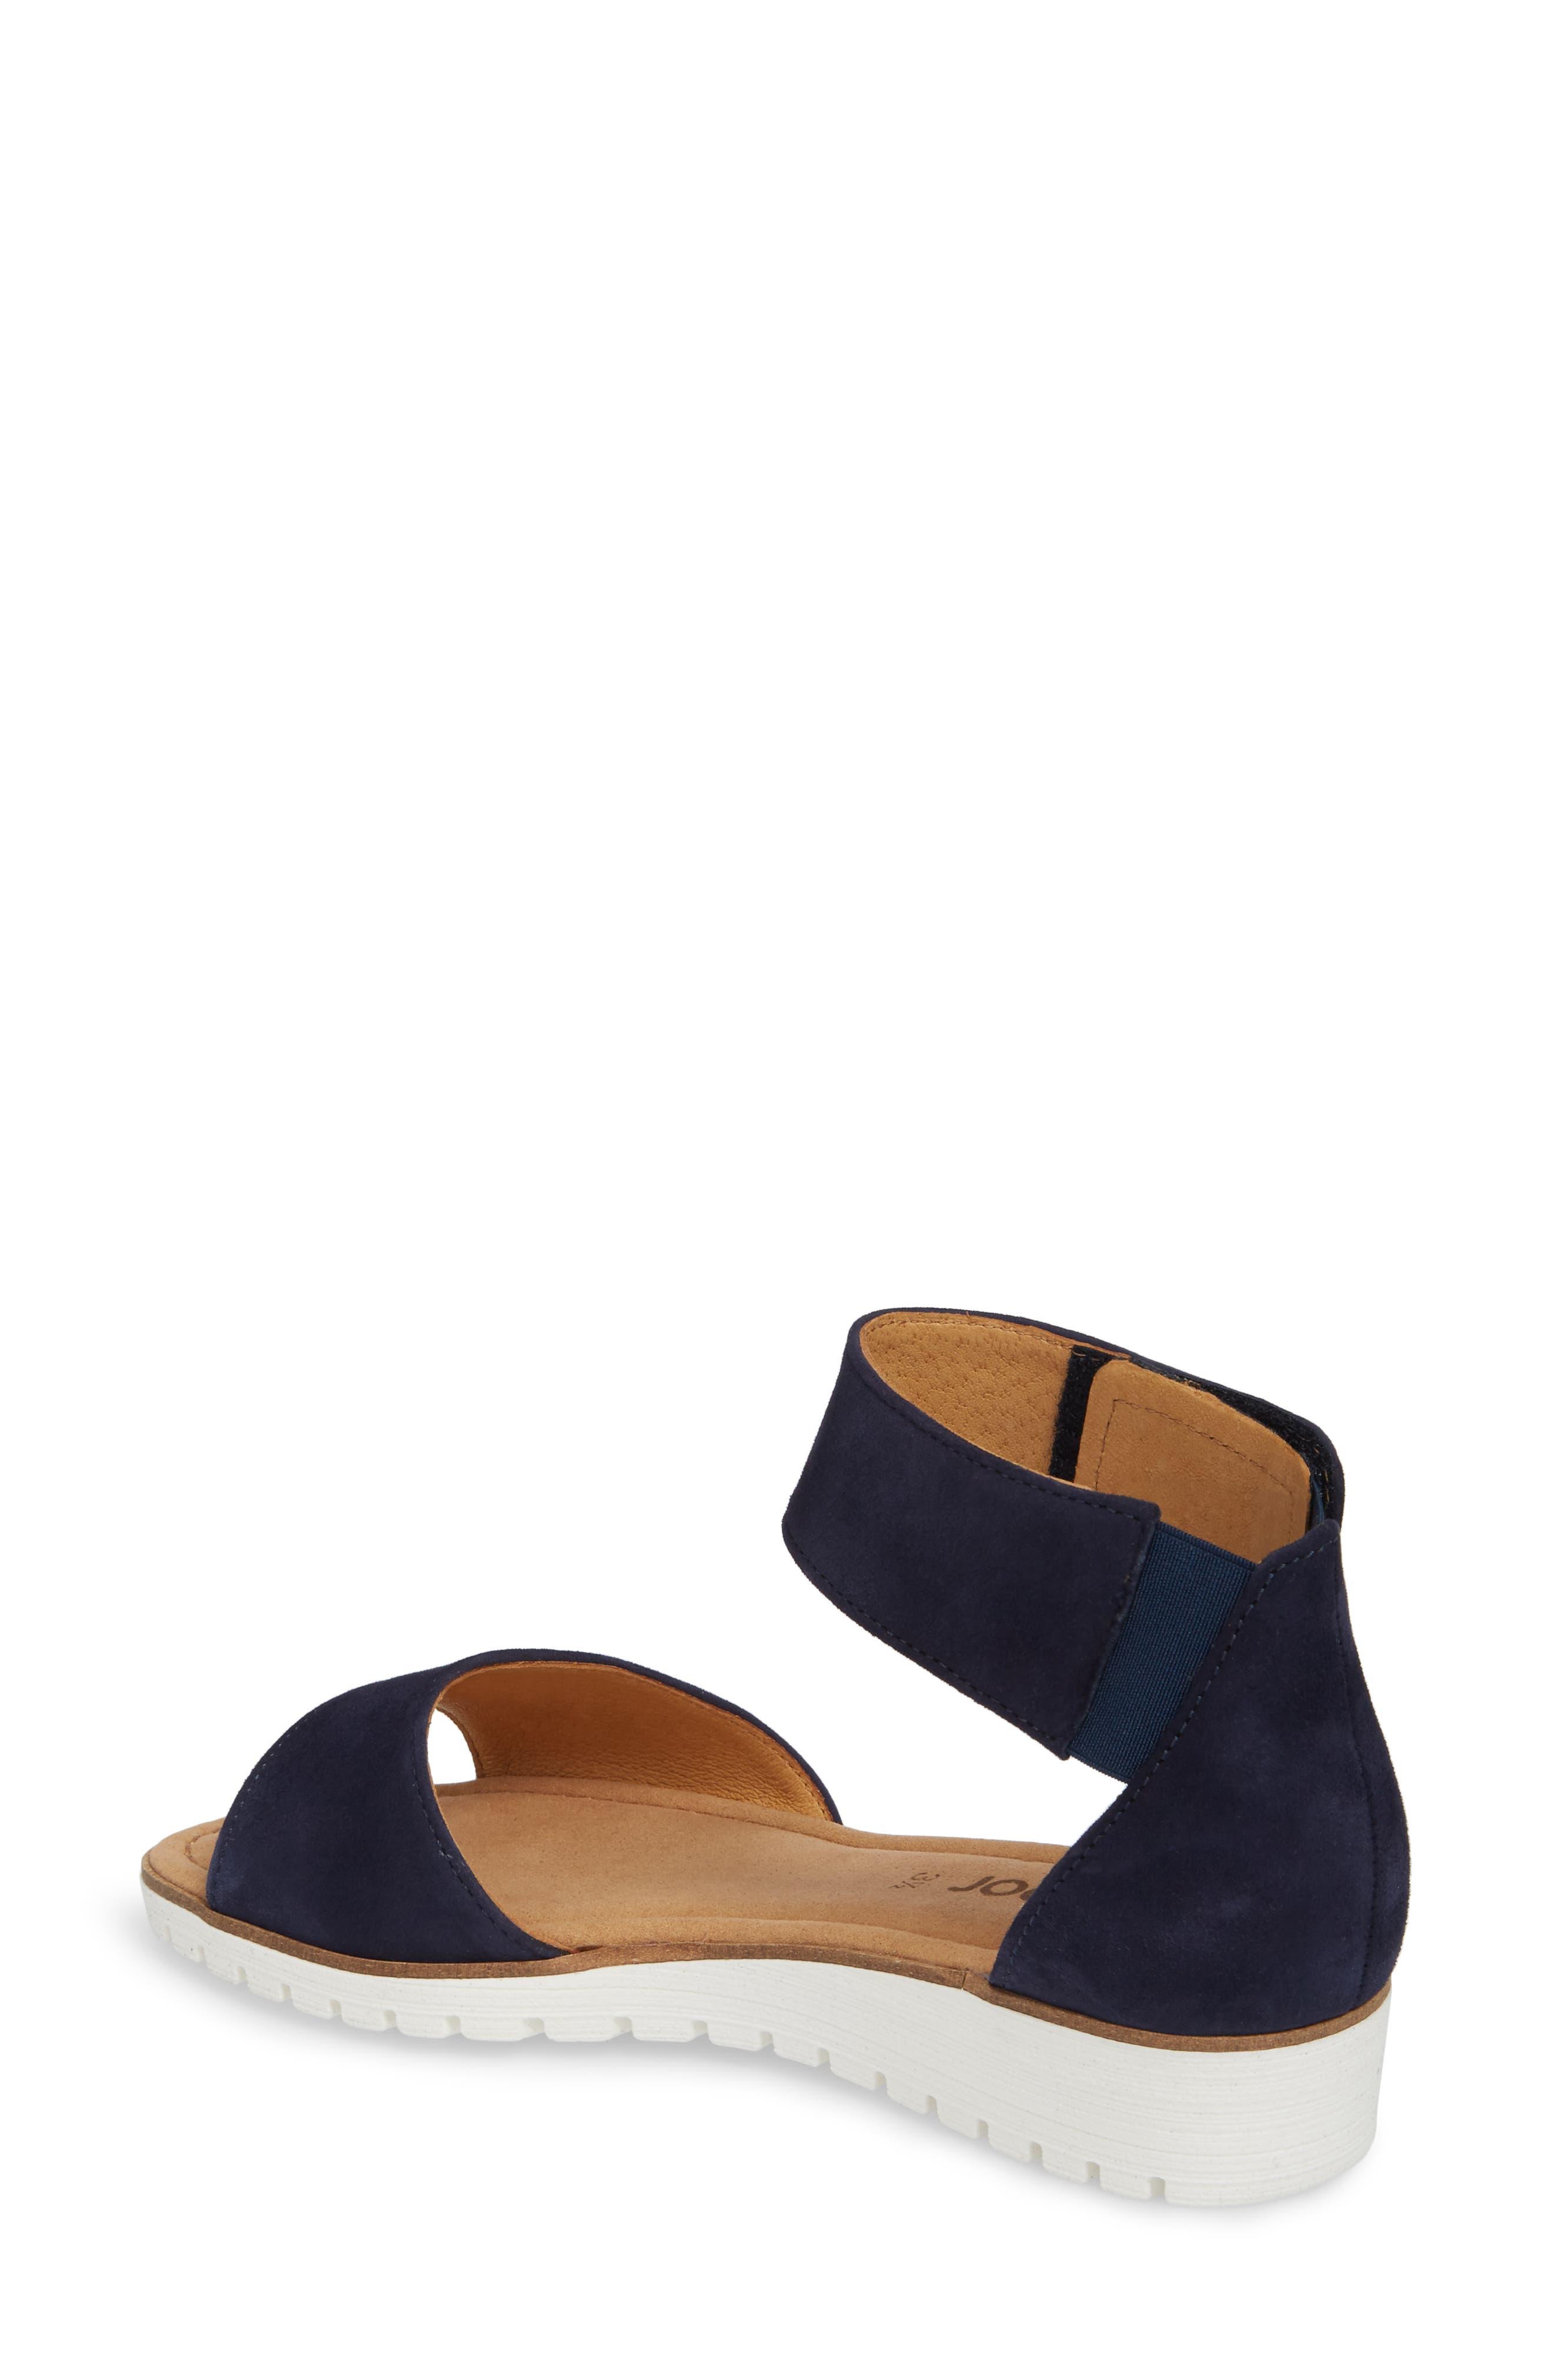 Ankle Strap Sandal,                             Alternate thumbnail 2, color,                             BLUE SUEDE